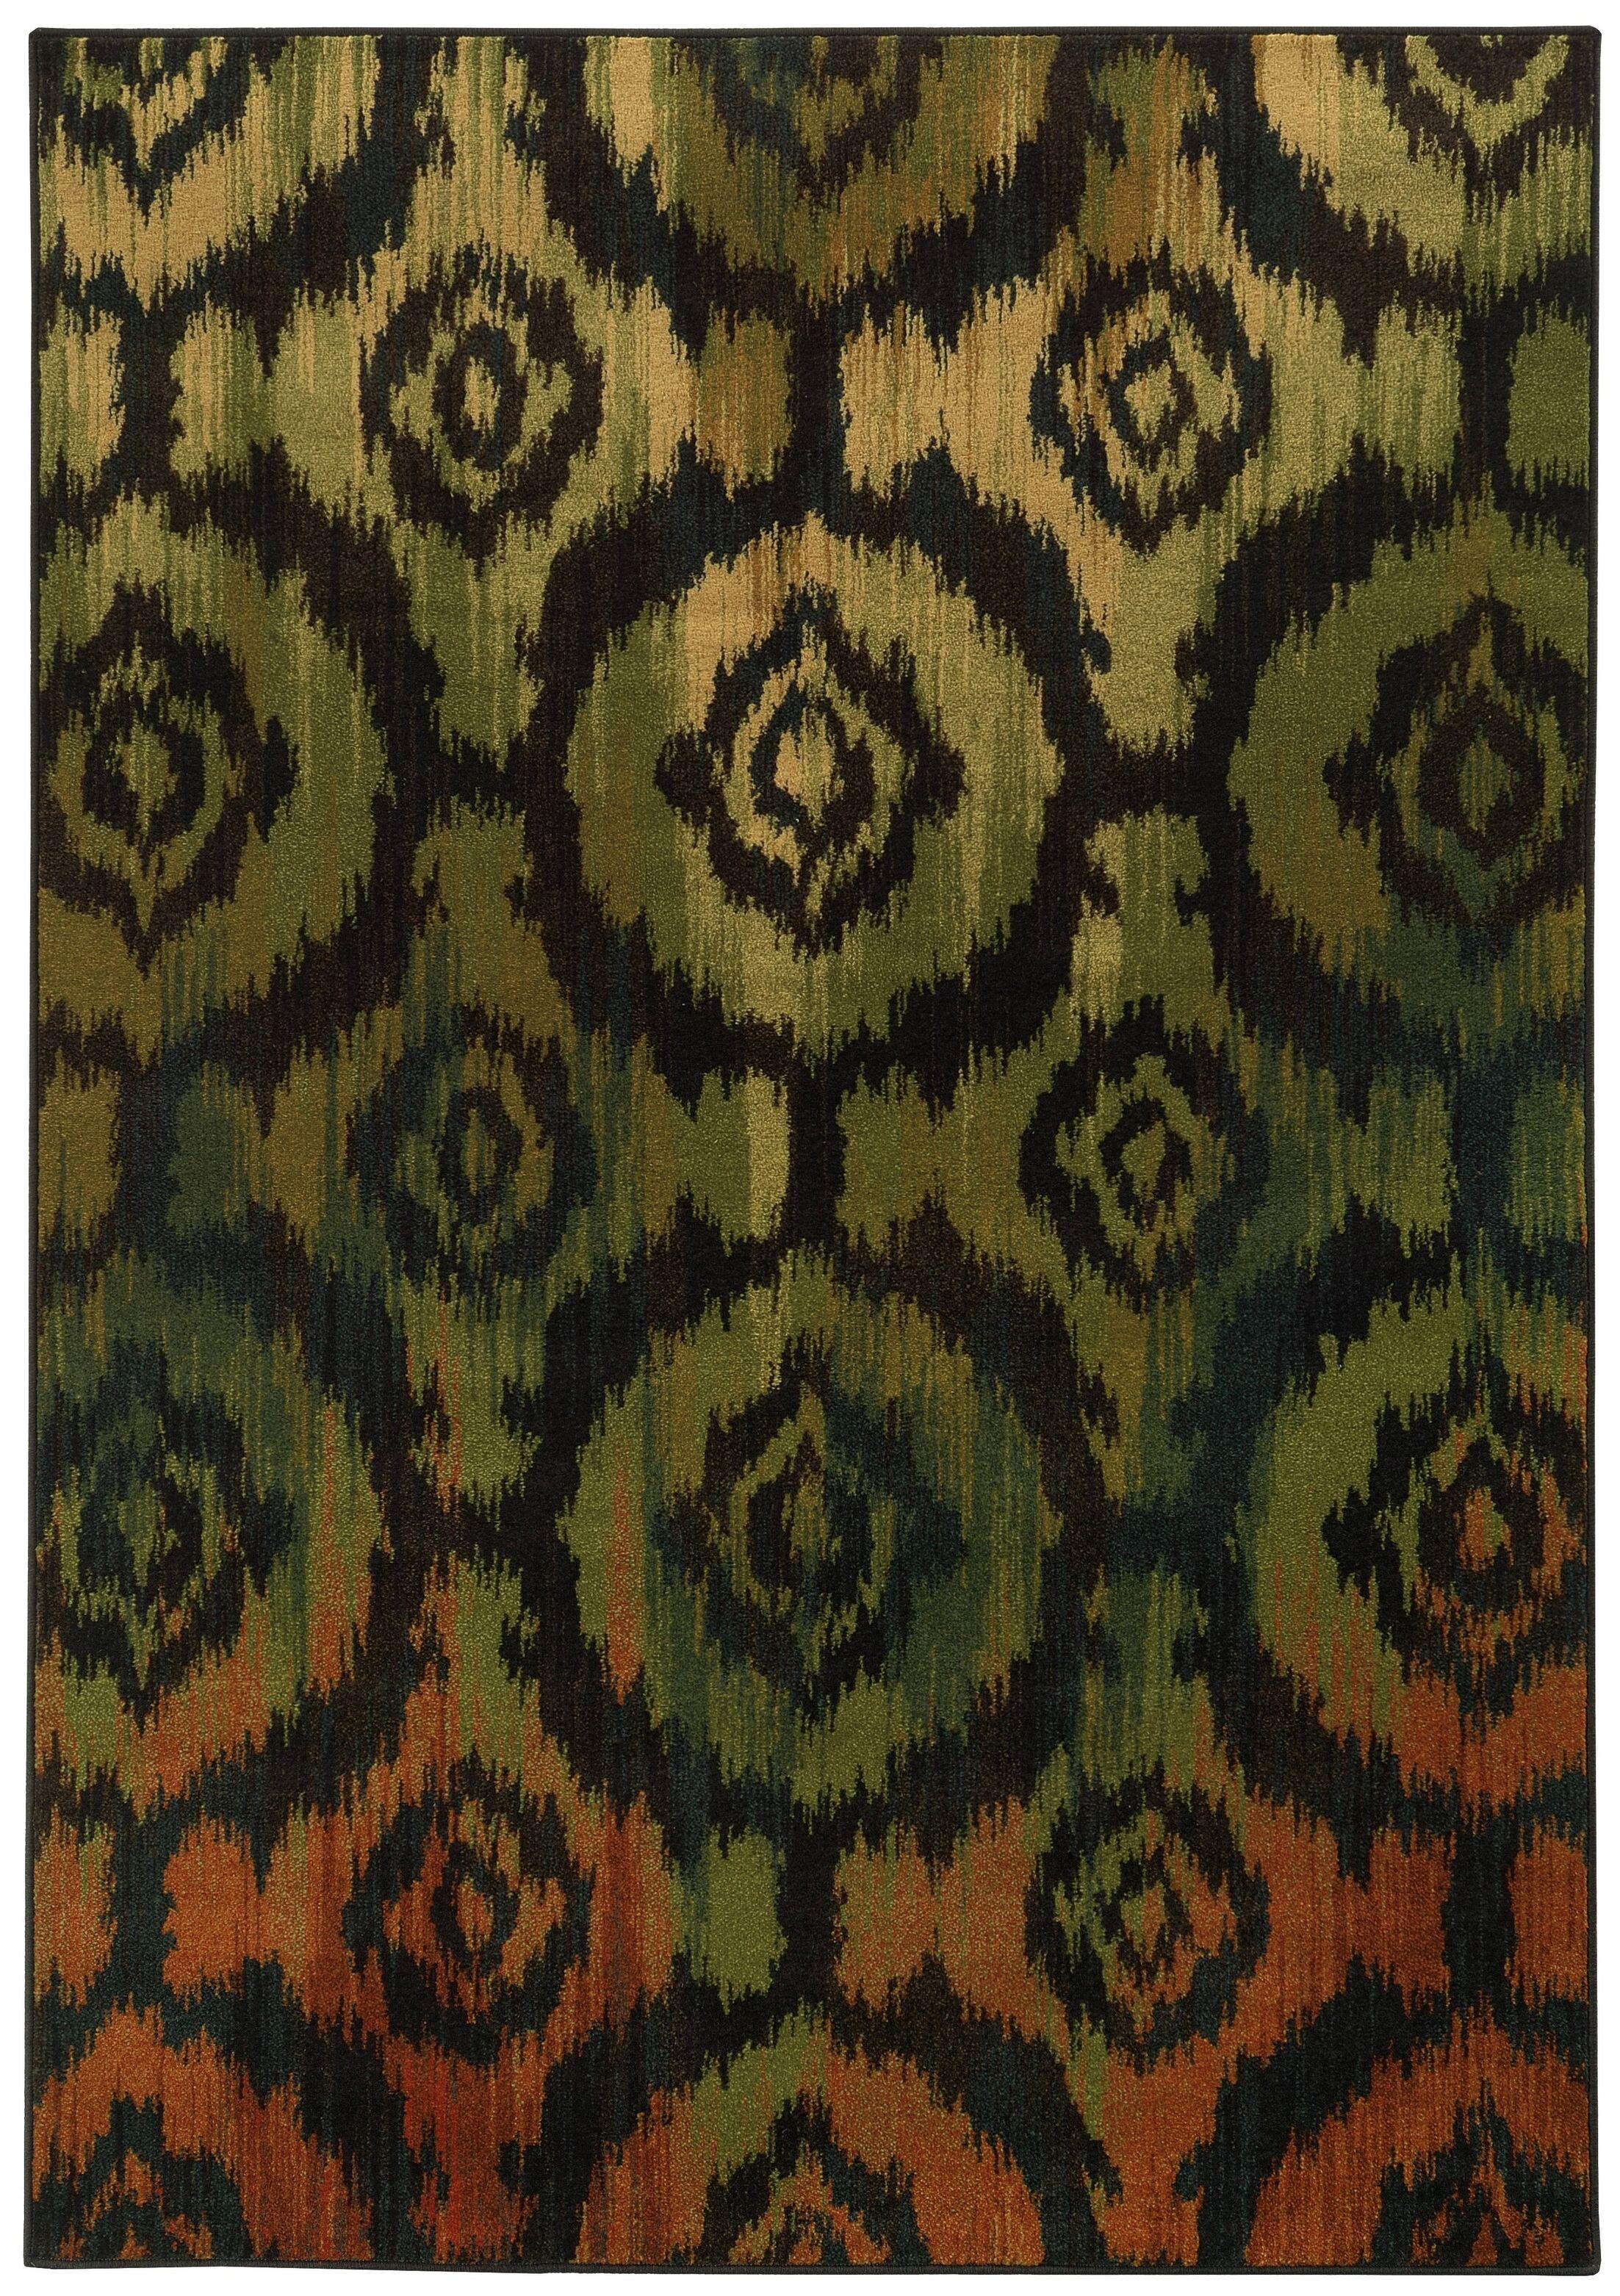 Prince Modern Black/Green Area Rug Rug Size: Rectangle 3'10